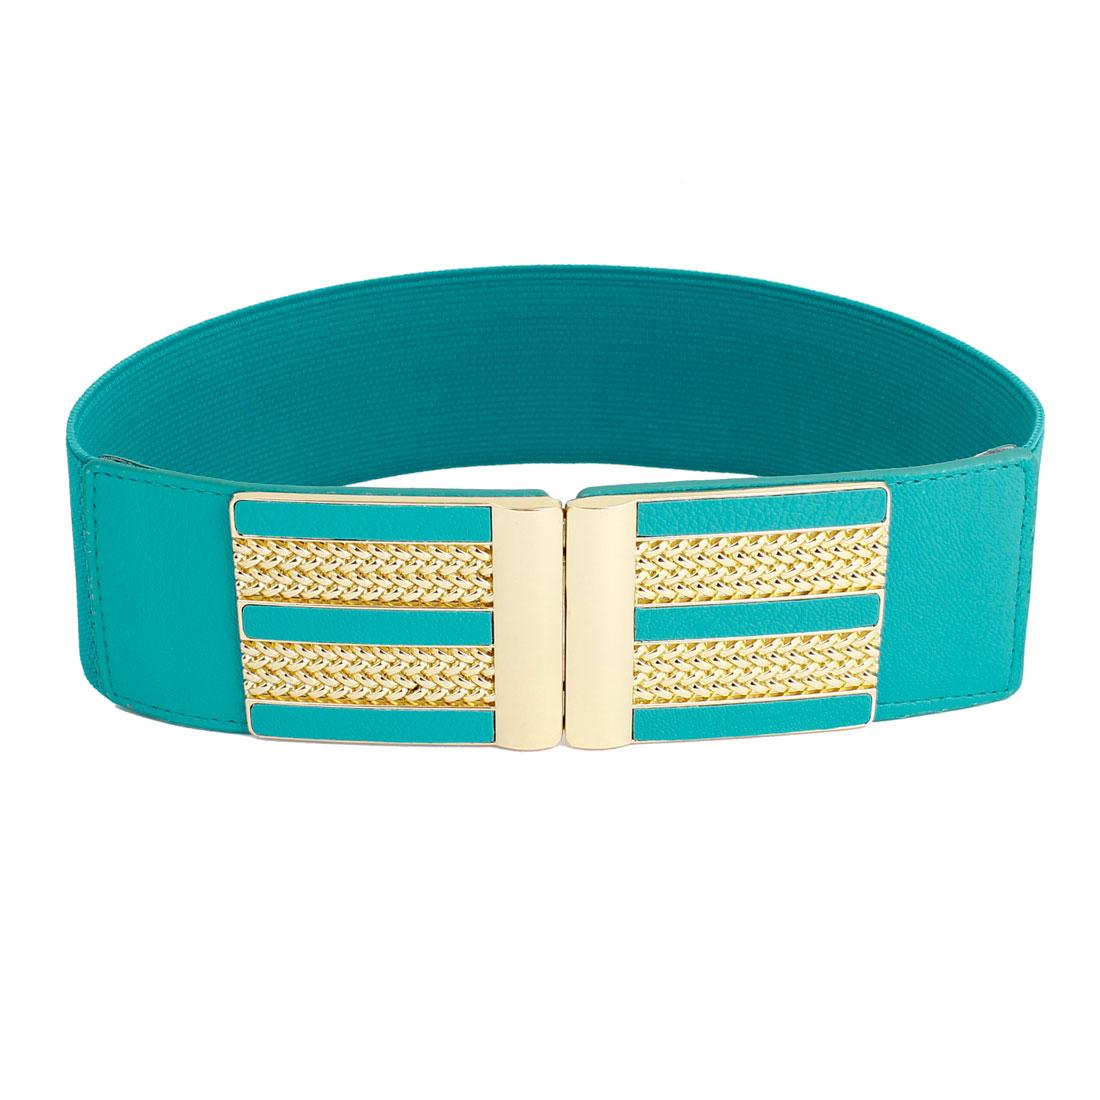 Gold Tone Metal Interlocking Buckle Stretch Cinch Waist Belt Teal Green for Lady